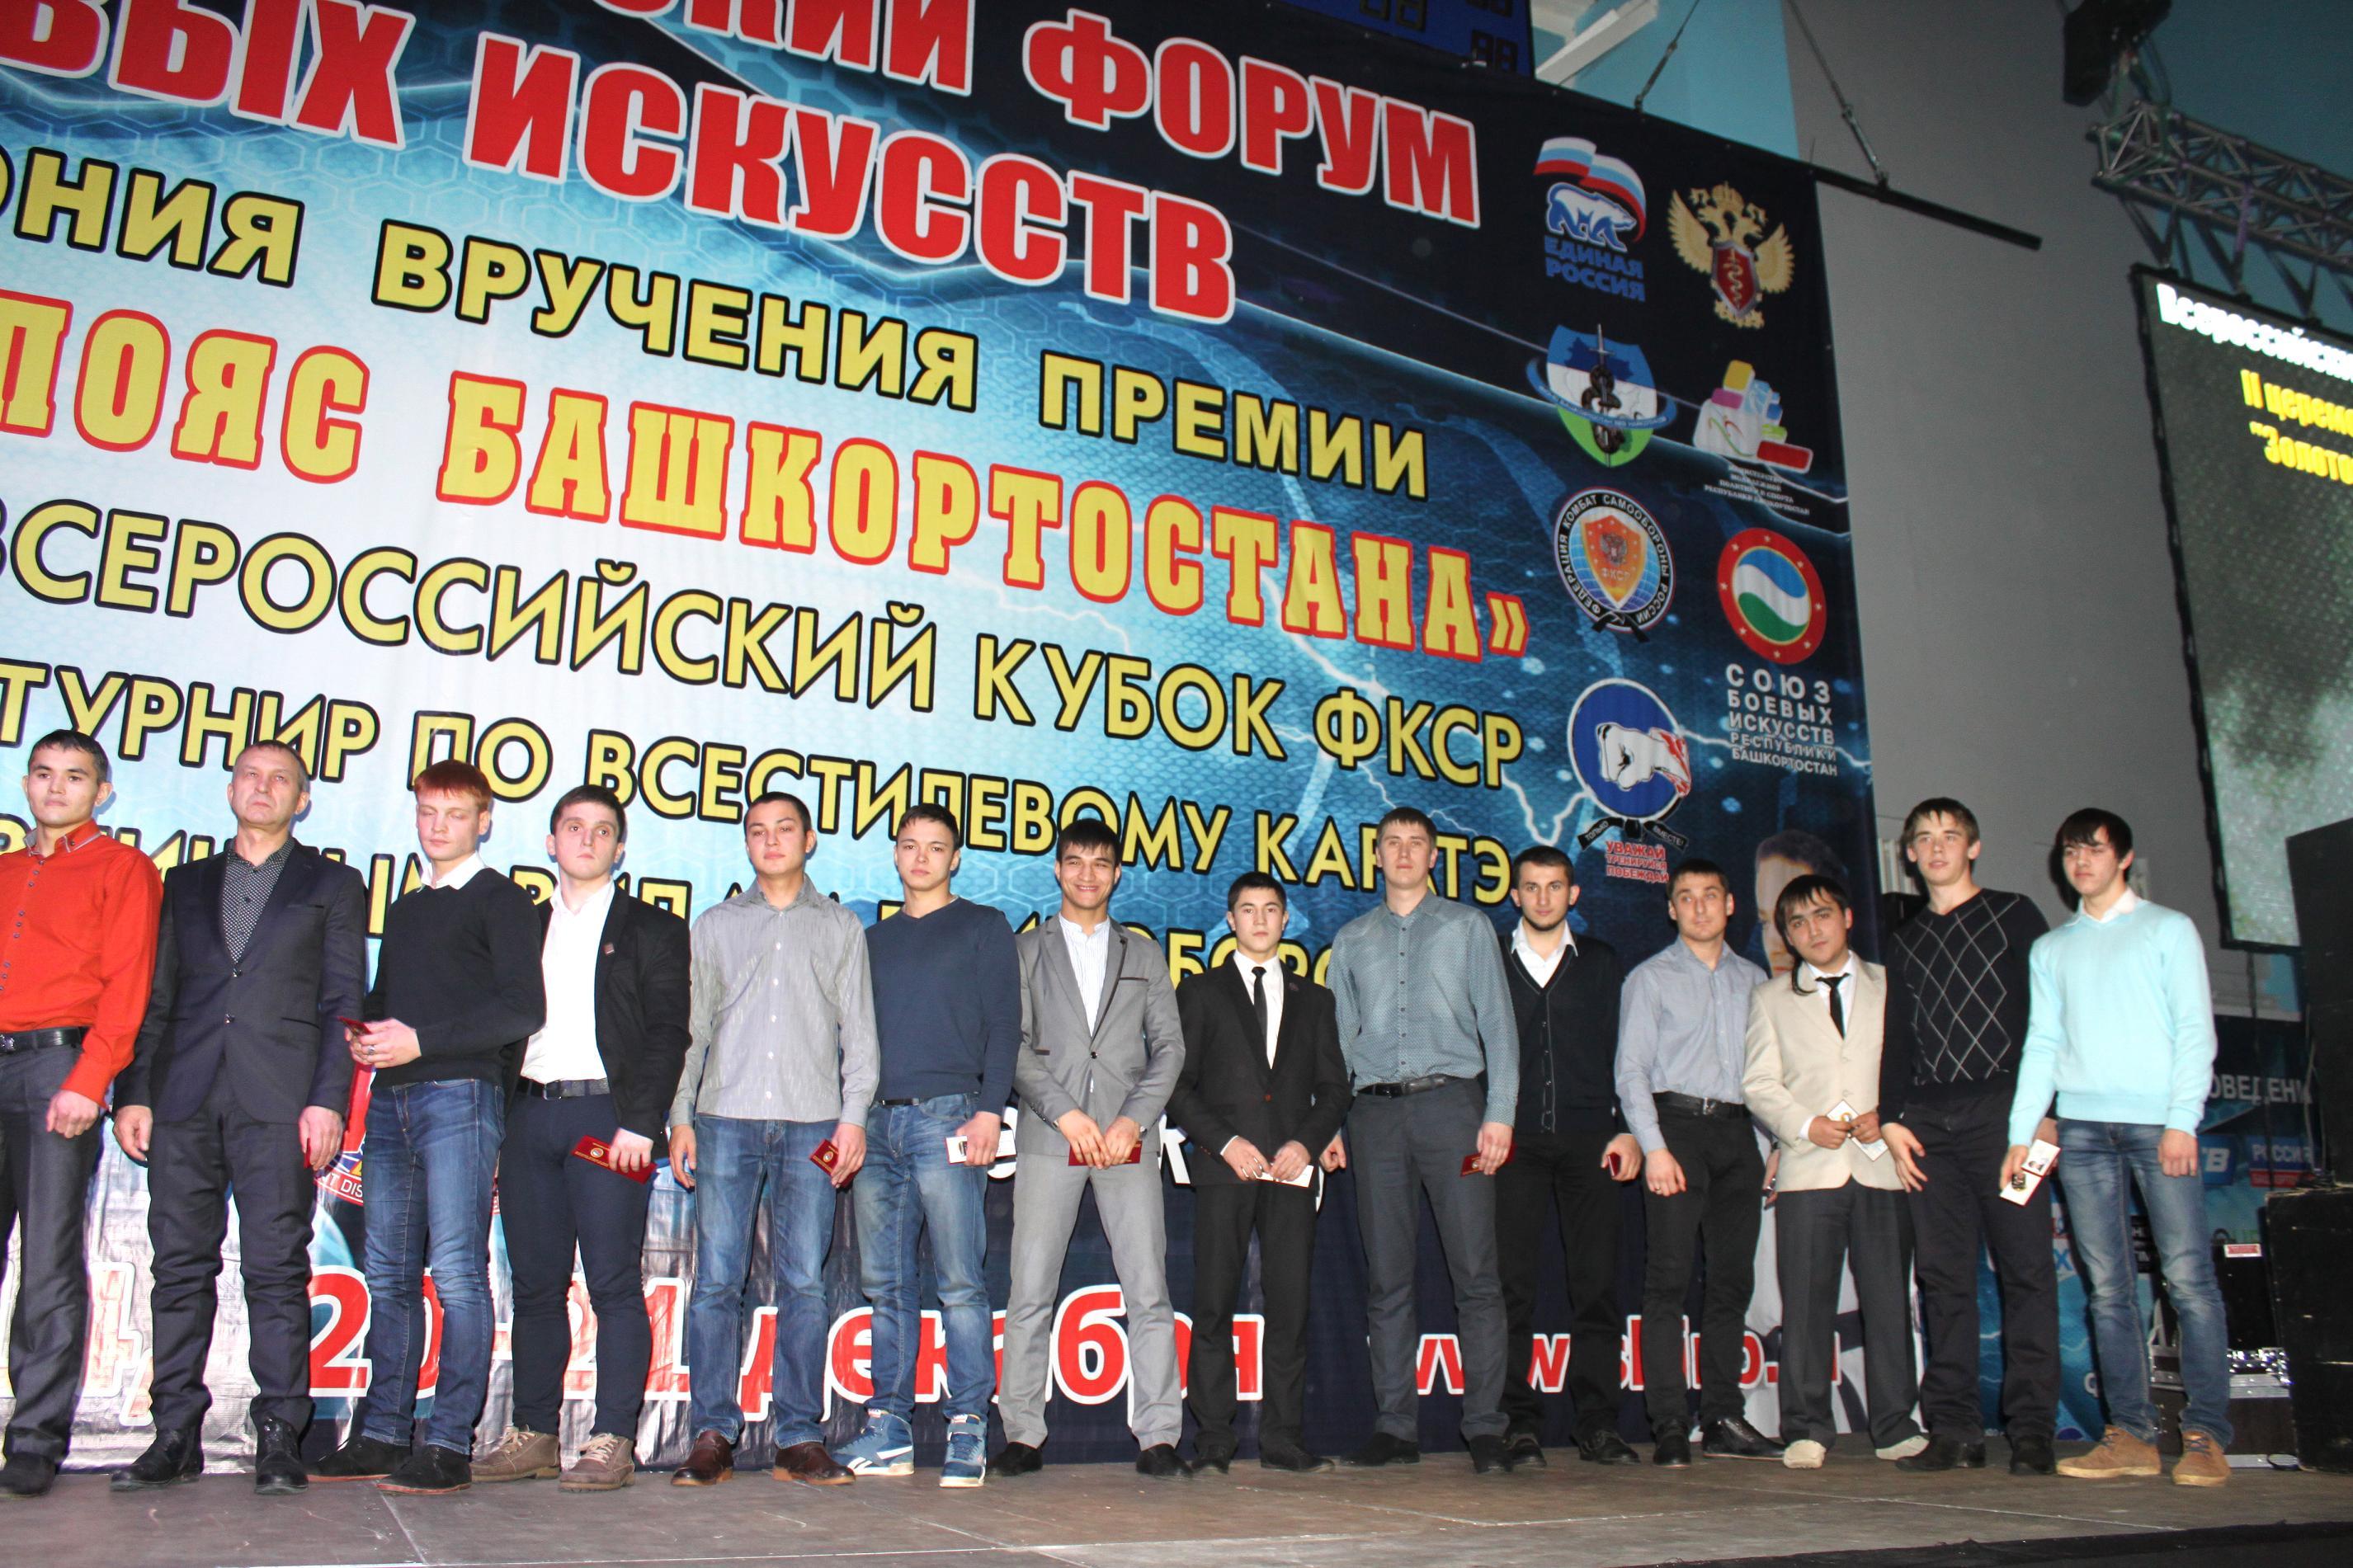 http://sbirb.combatsd.ru/images/upload/IMG_9757.JPG